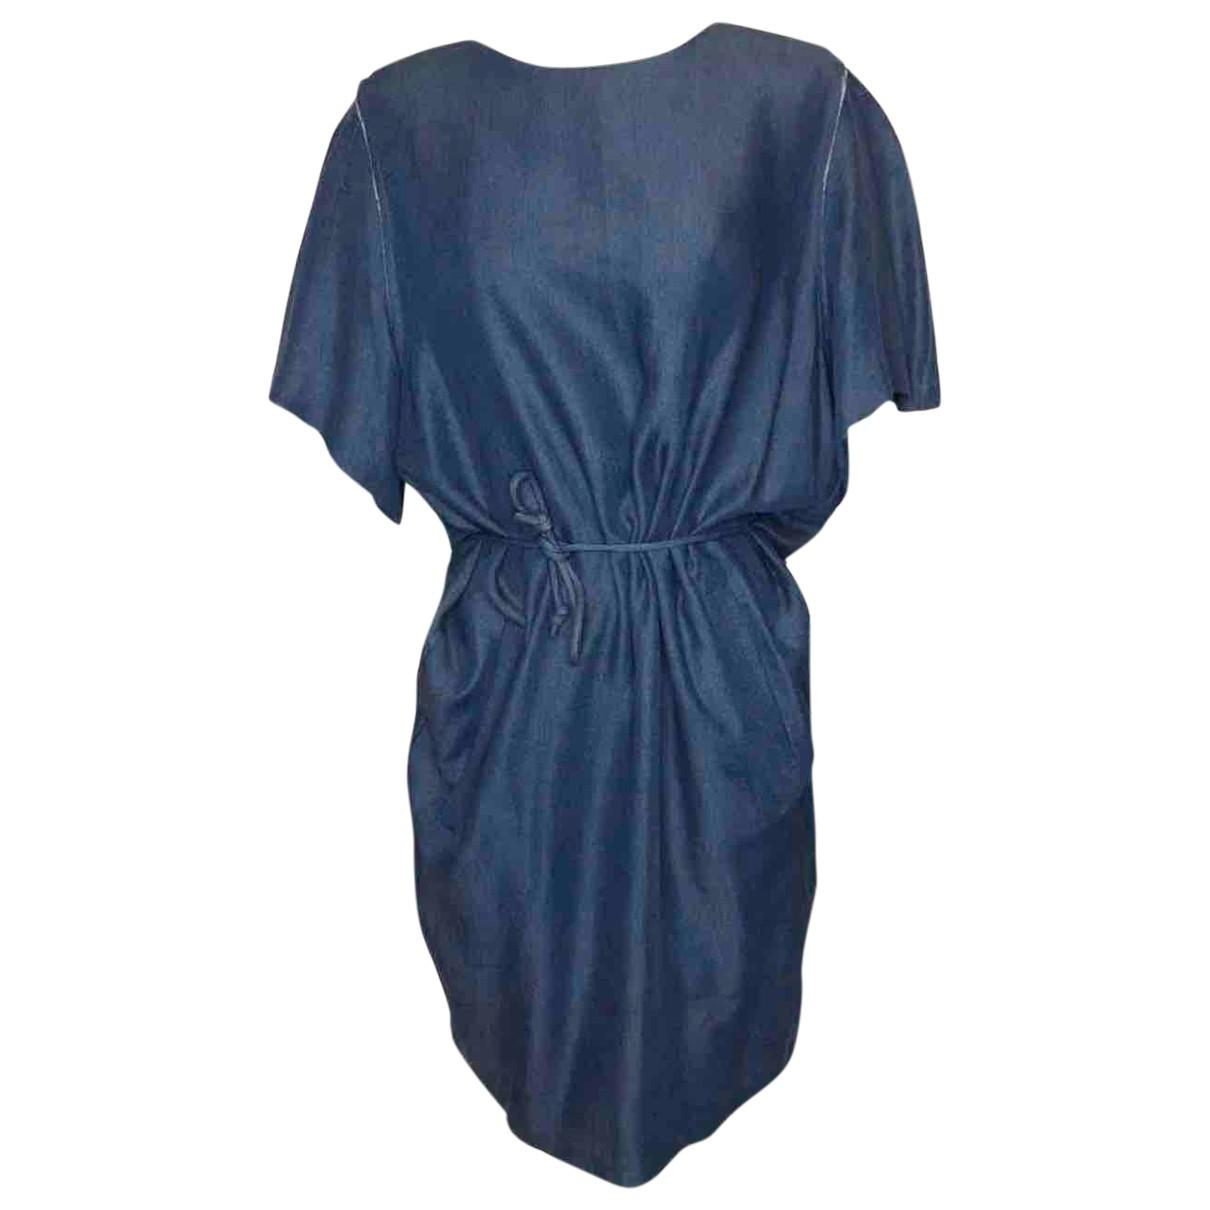 Acne Studios \N Blue Cotton - elasthane dress for Women 36 FR